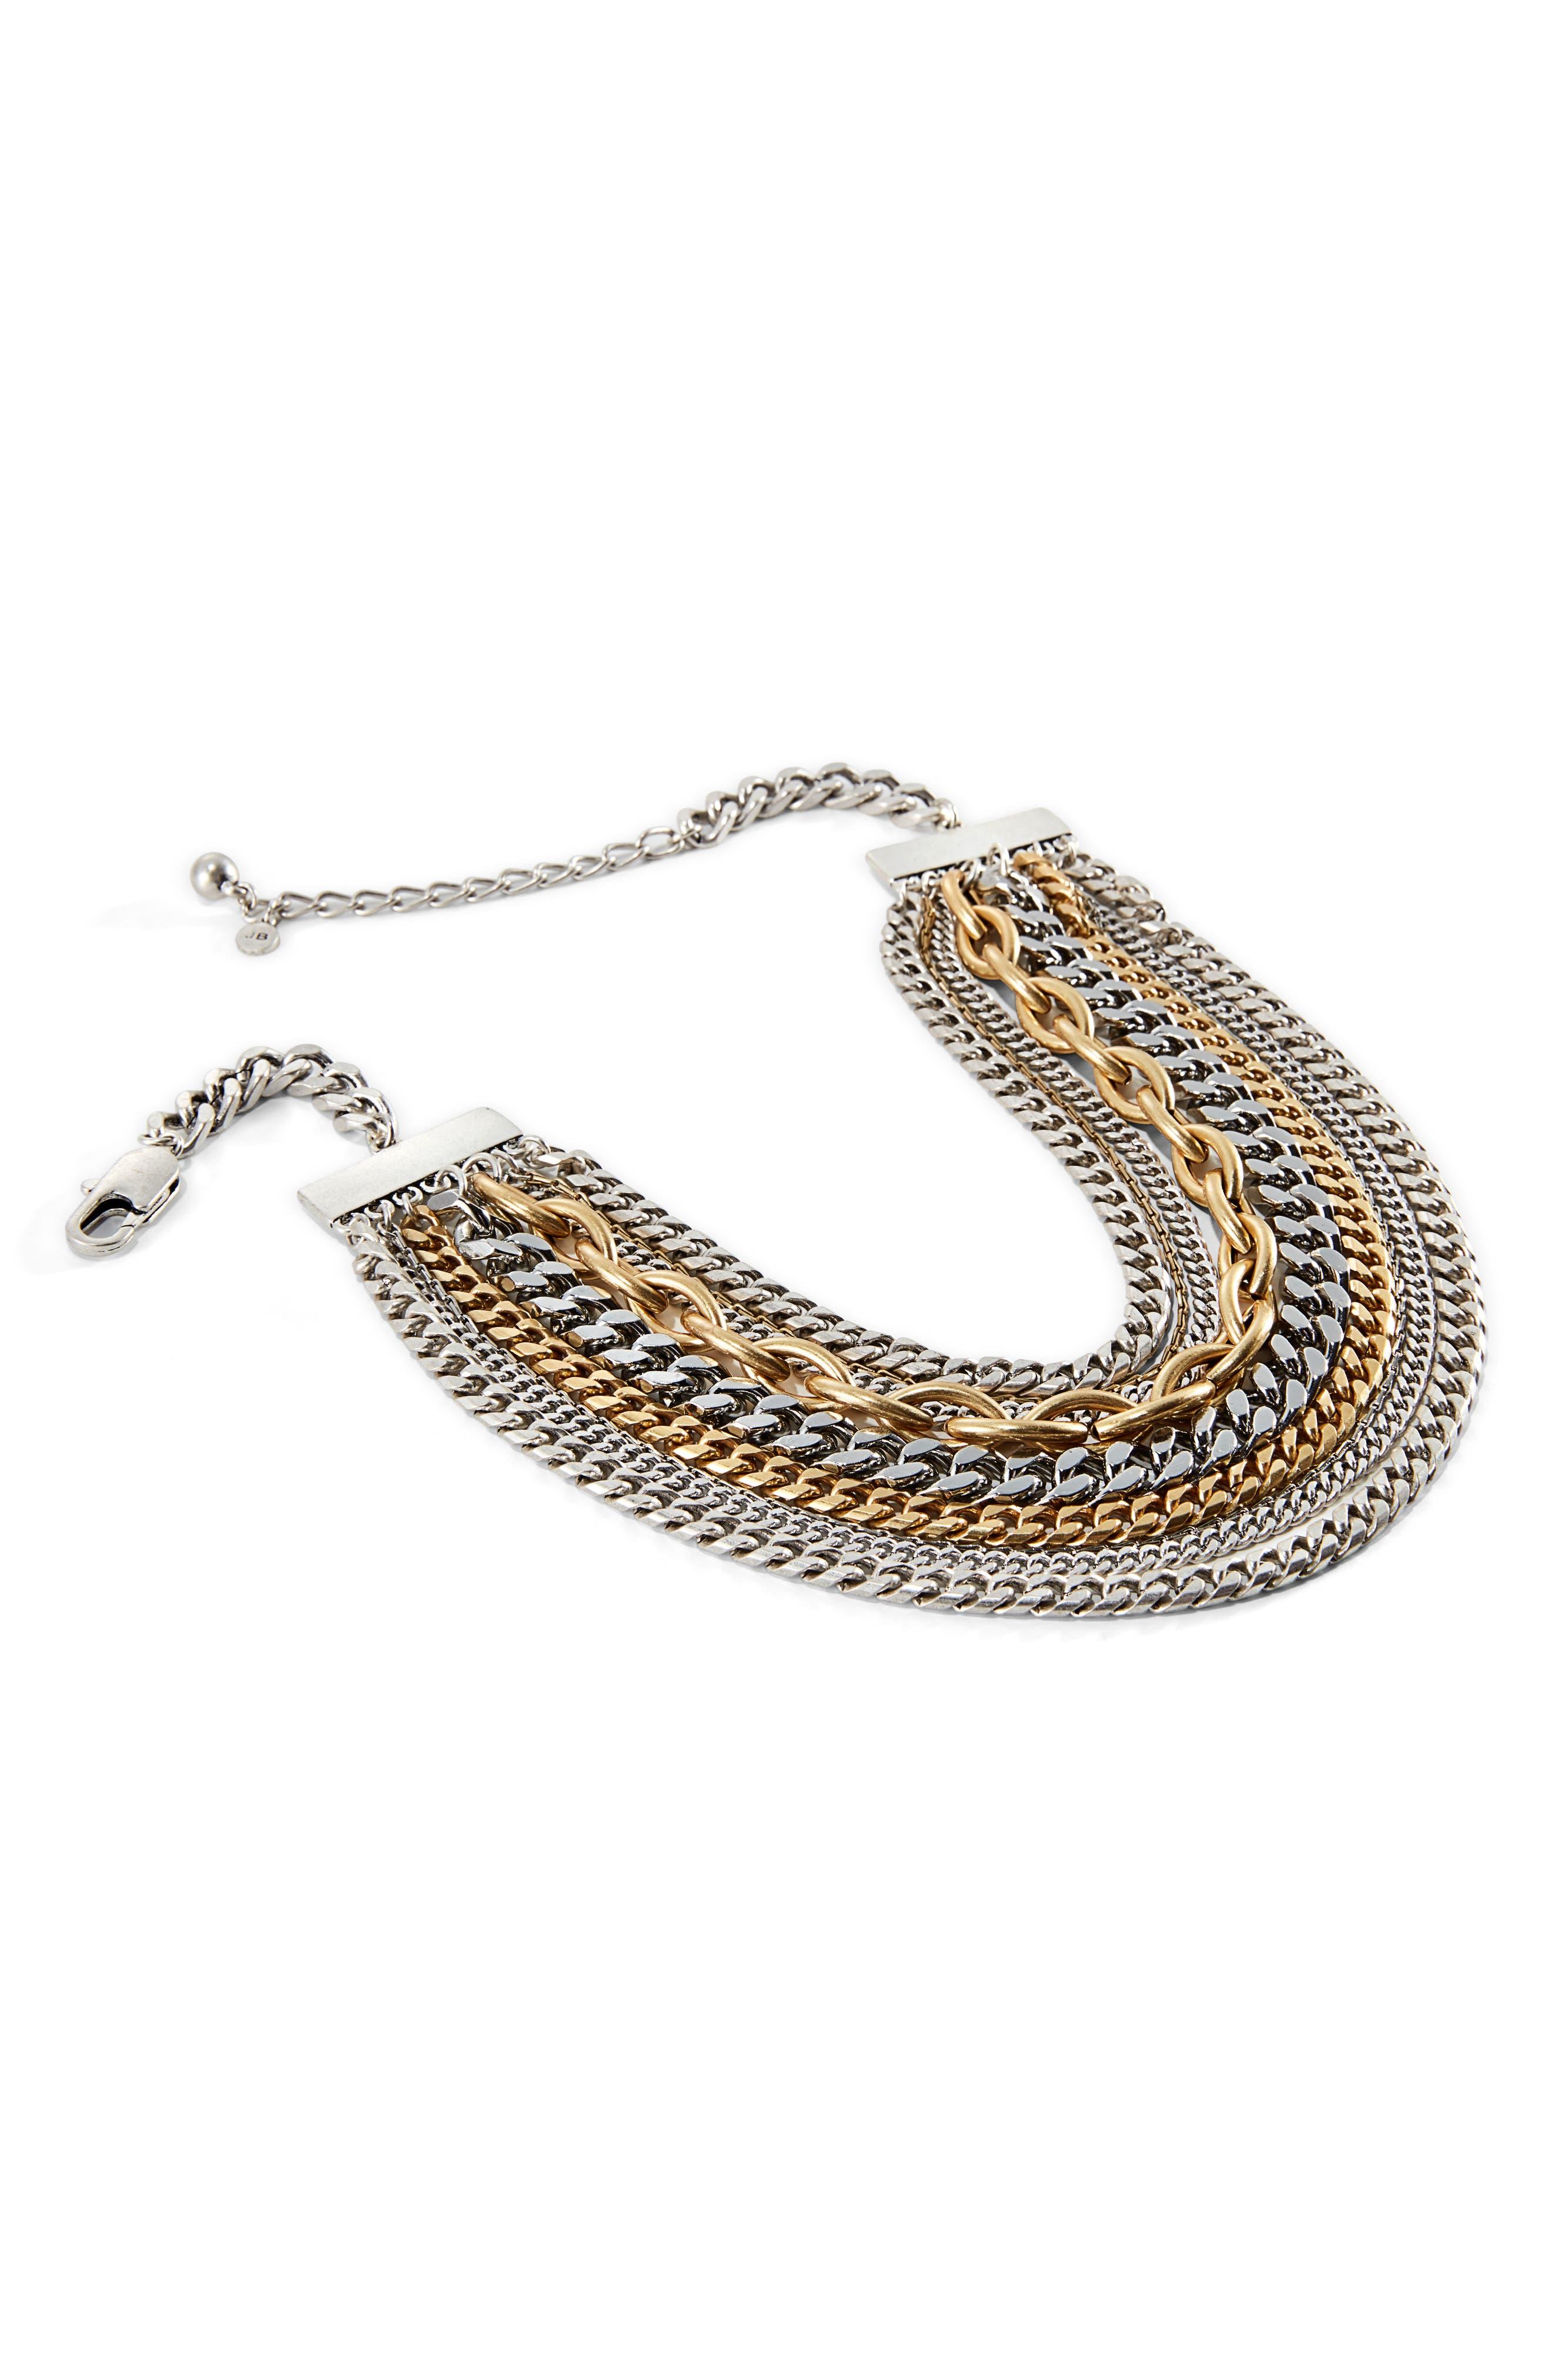 Marra Collar Necklace,                         Main,                         color, Silver Multi